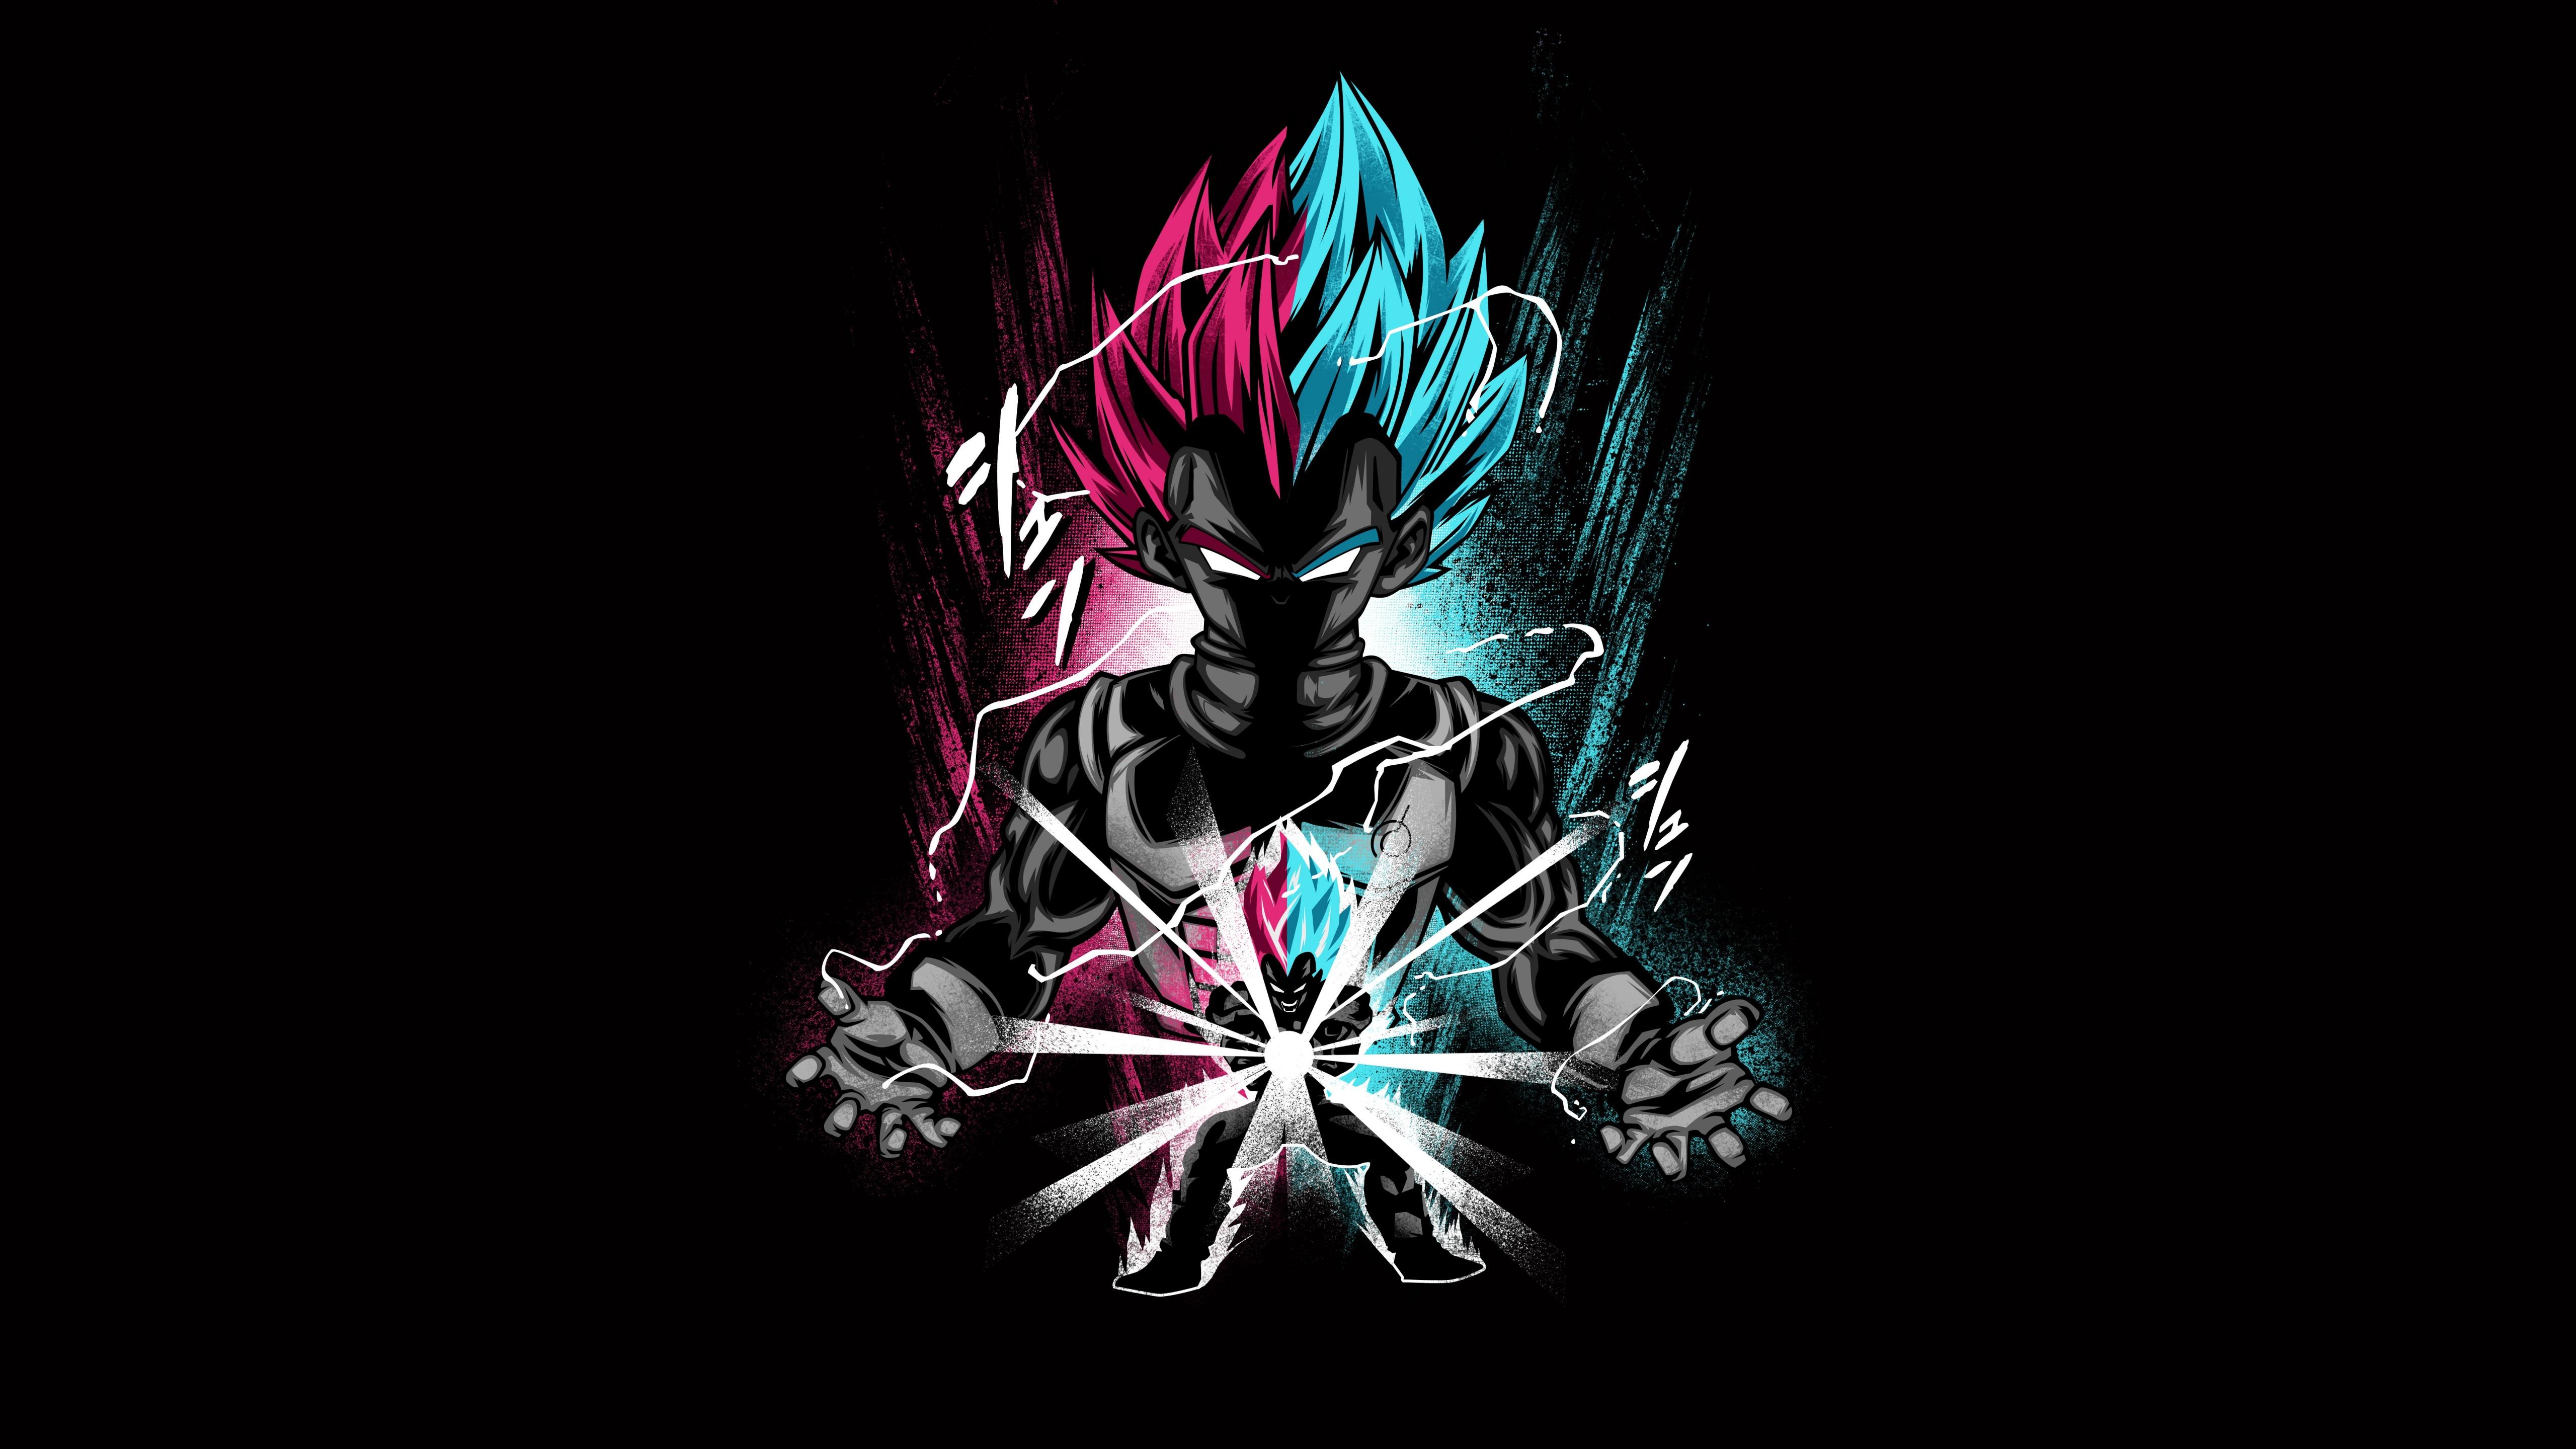 Vegeta 4K Wallpaper, Dragon Ball Z, Anime series, Black ...